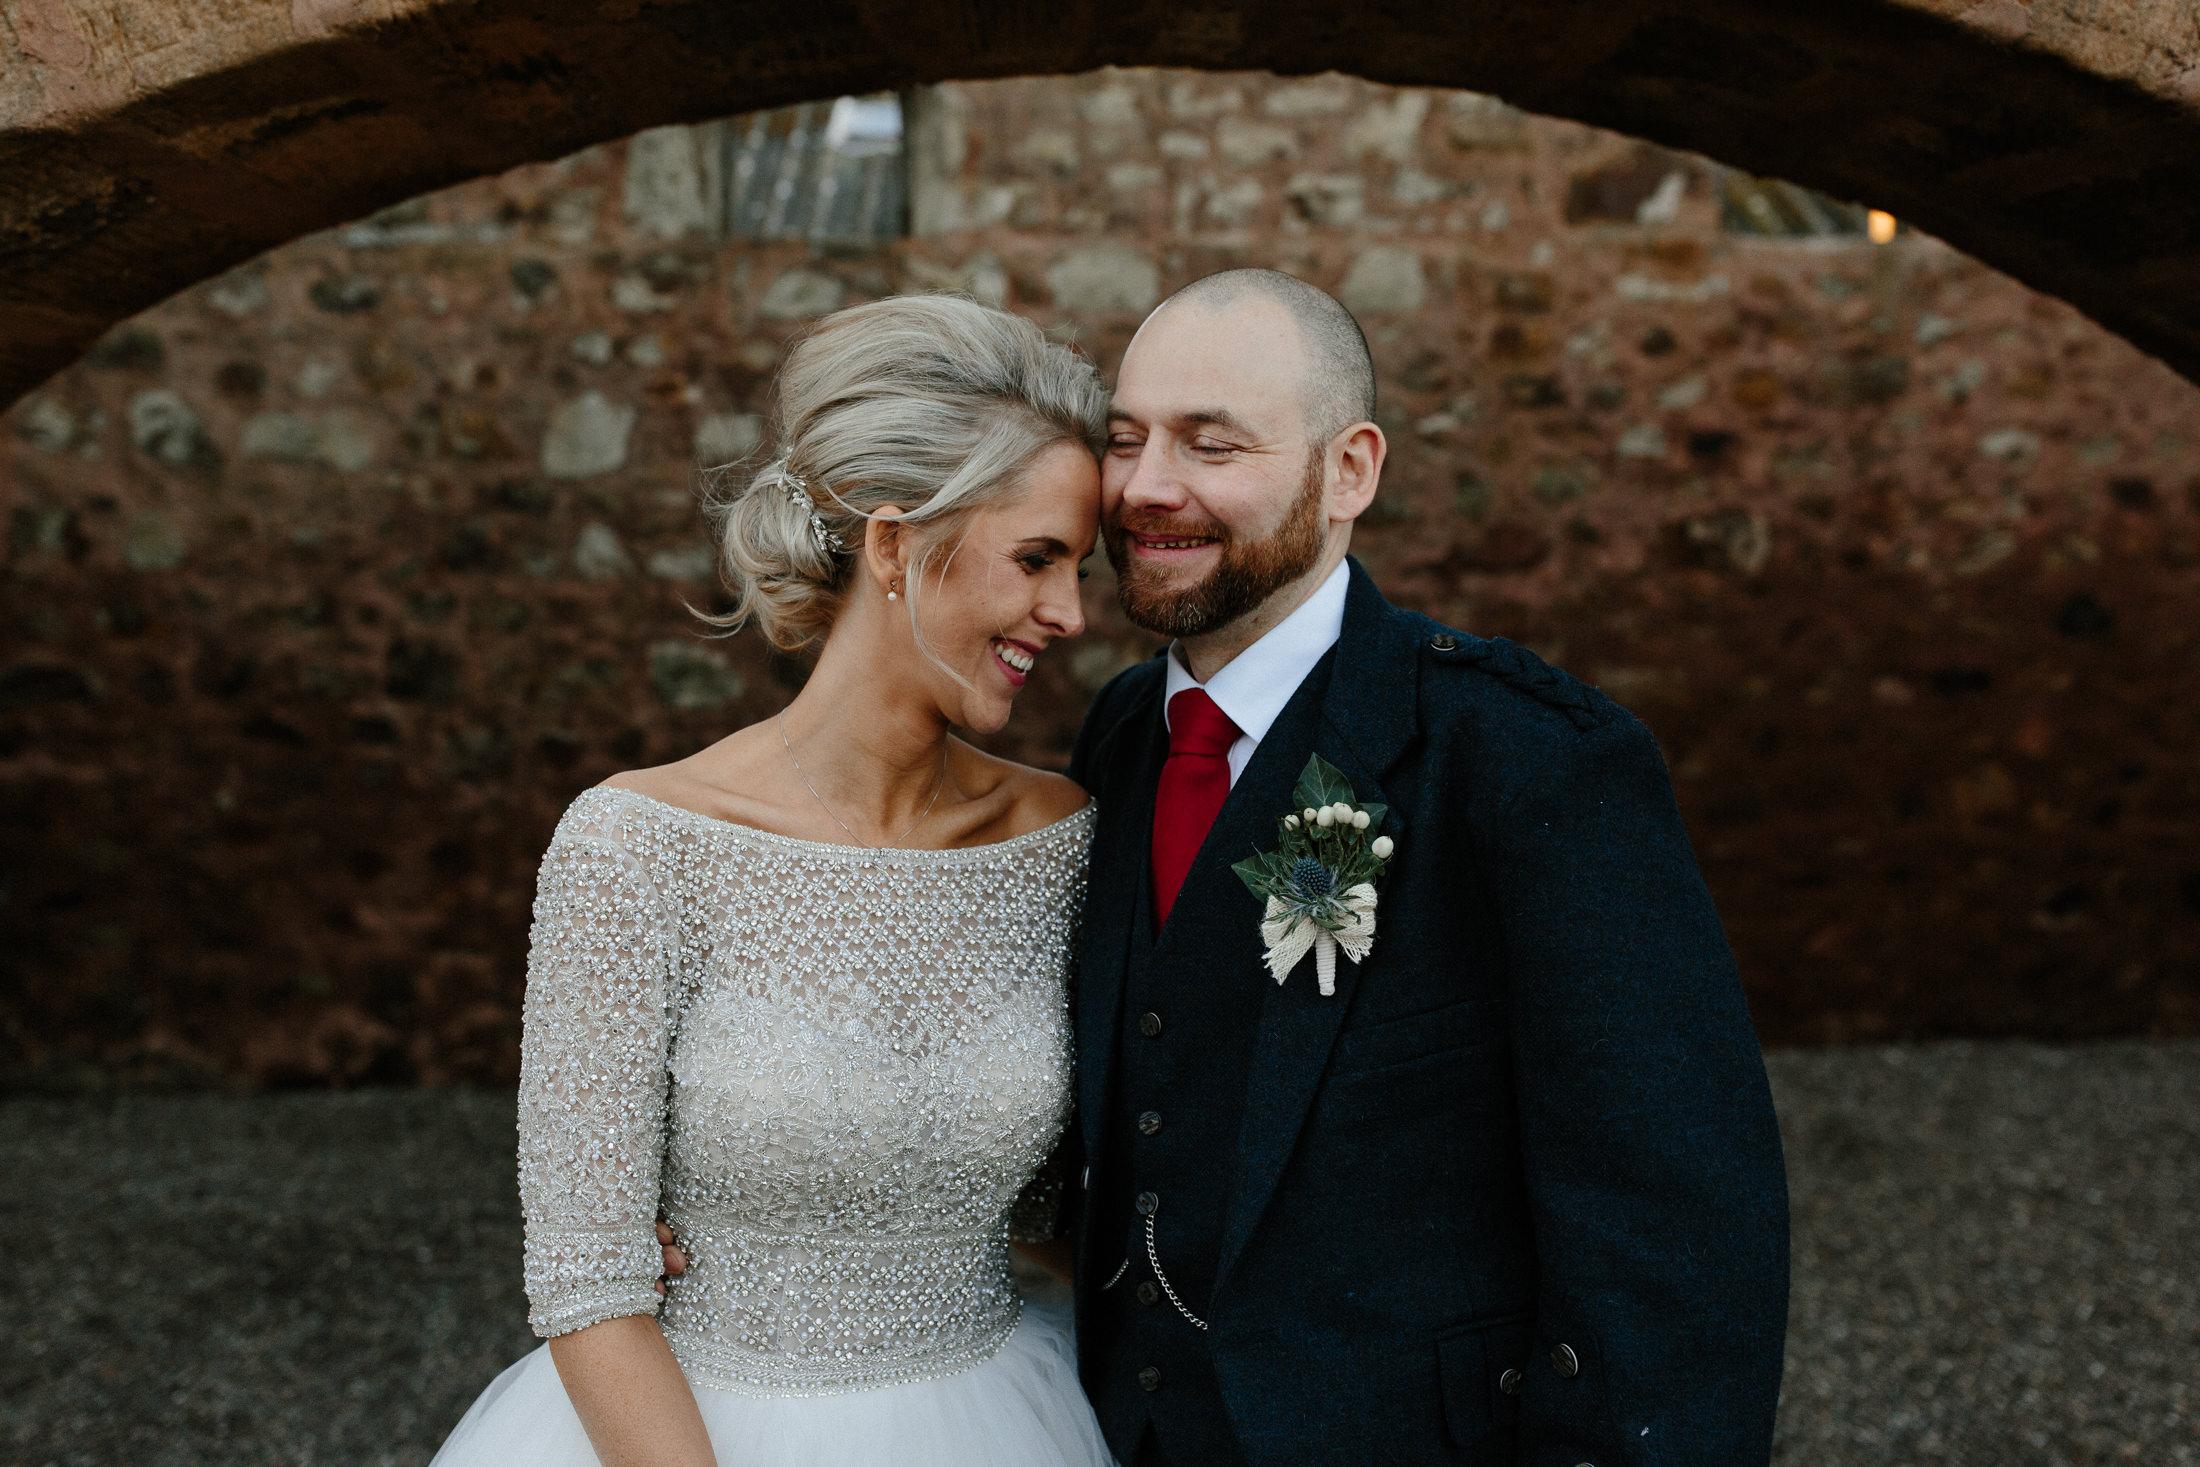 Kayleigh-Michael-Cow-Shed-Cowshed-Crail-Fife-Coastal-Rustic-Barn-Lianne-Mackay-Wedding-Photography-Photographer-Edinburgh-Glasgow-Scotland-WEB-RES-491.jpg